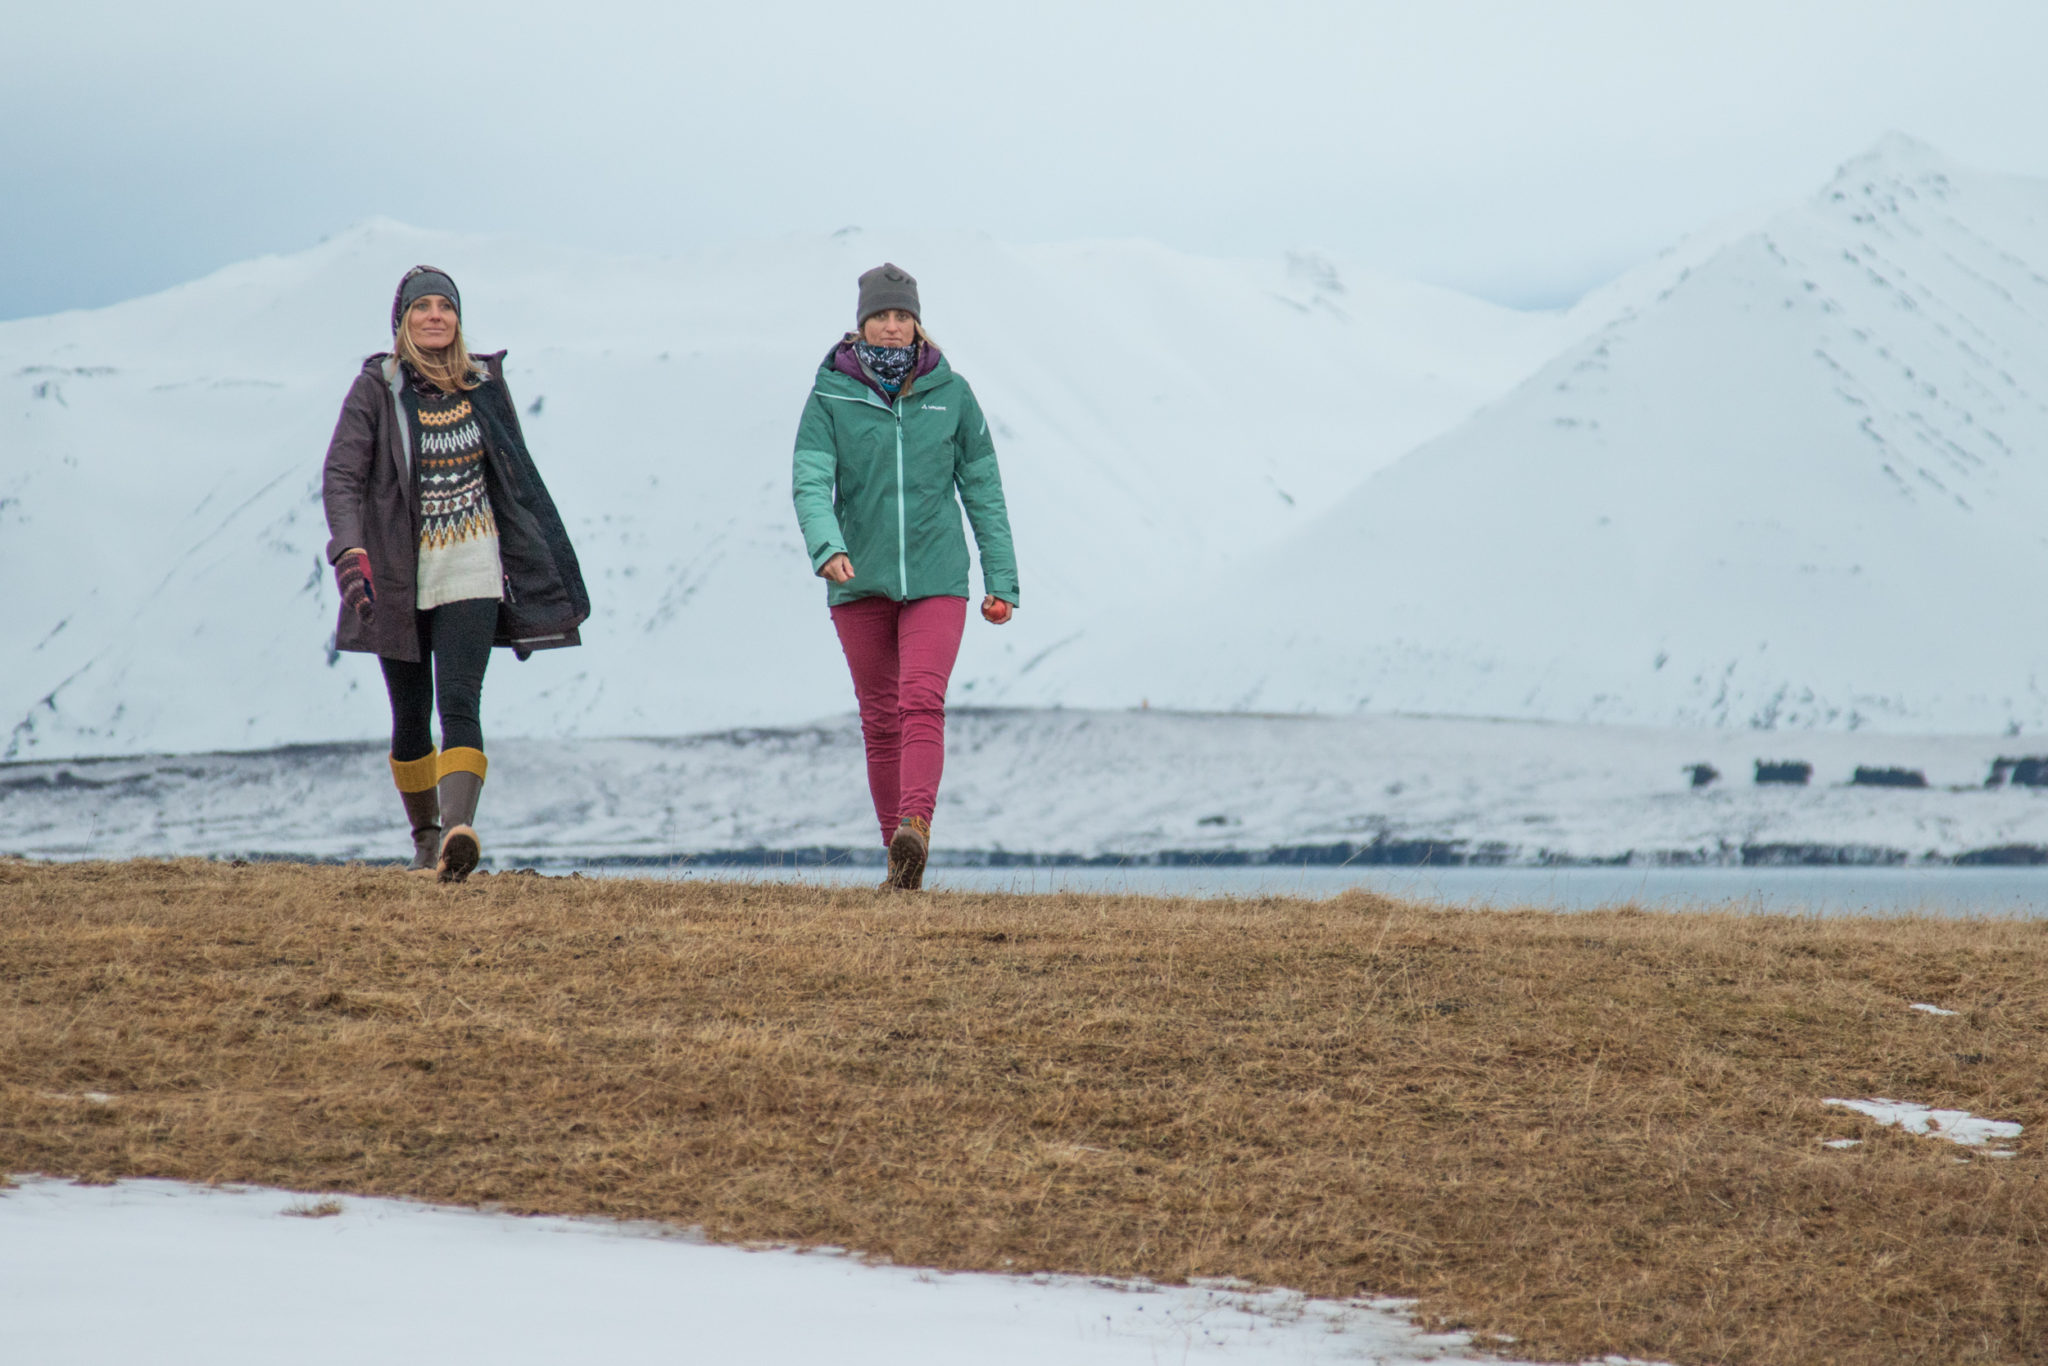 femmes-filles-snowboardeuses-splitboard-feminisme-film-engagé